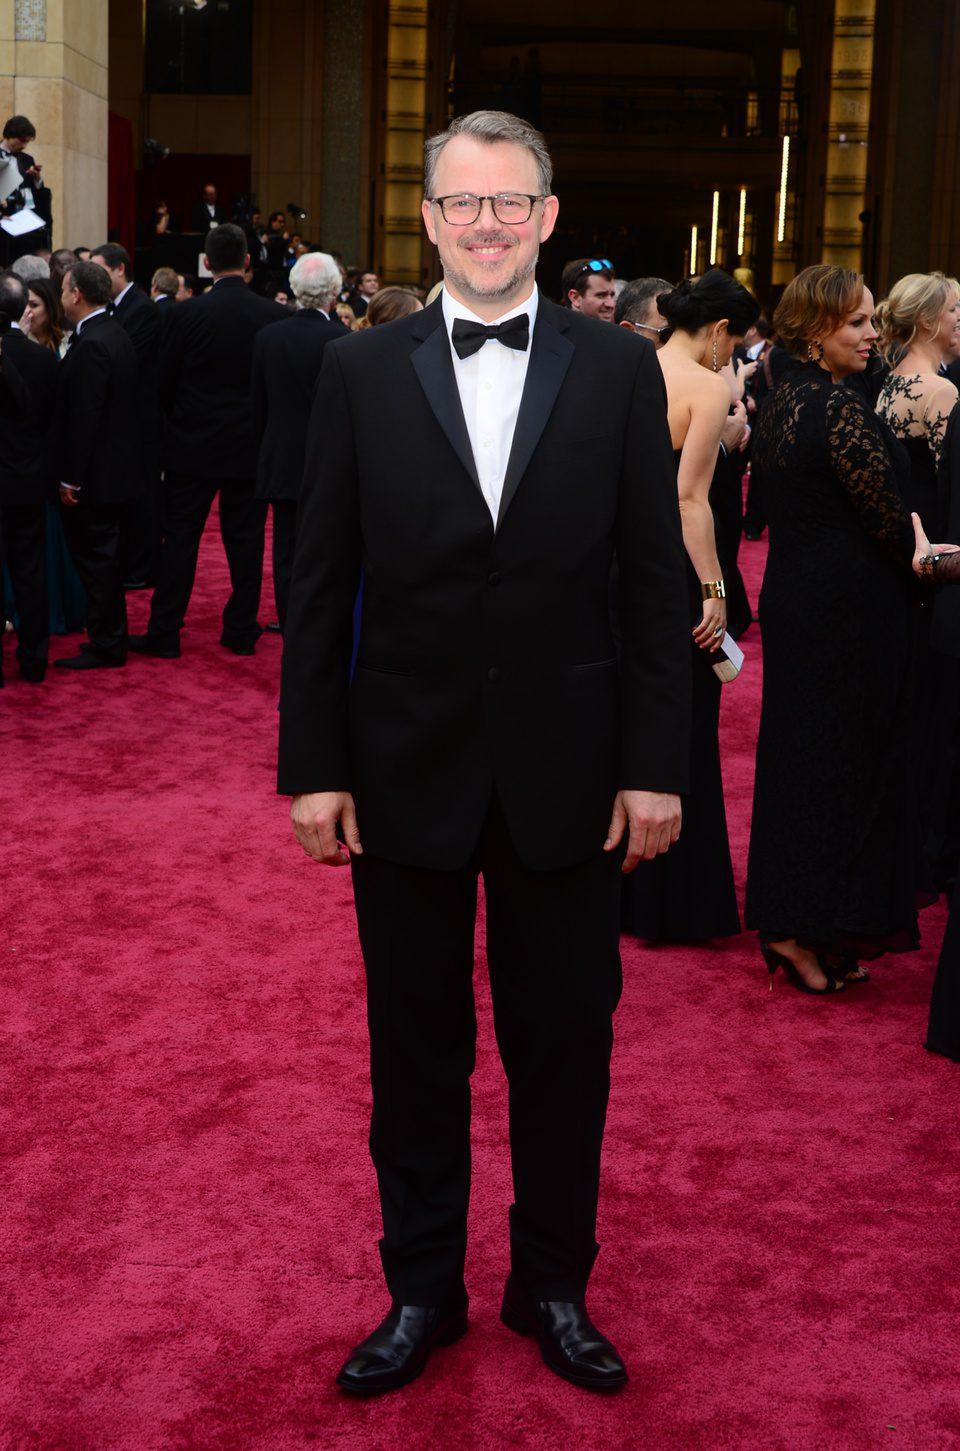 Edgar Barens at the 2014 Oscars